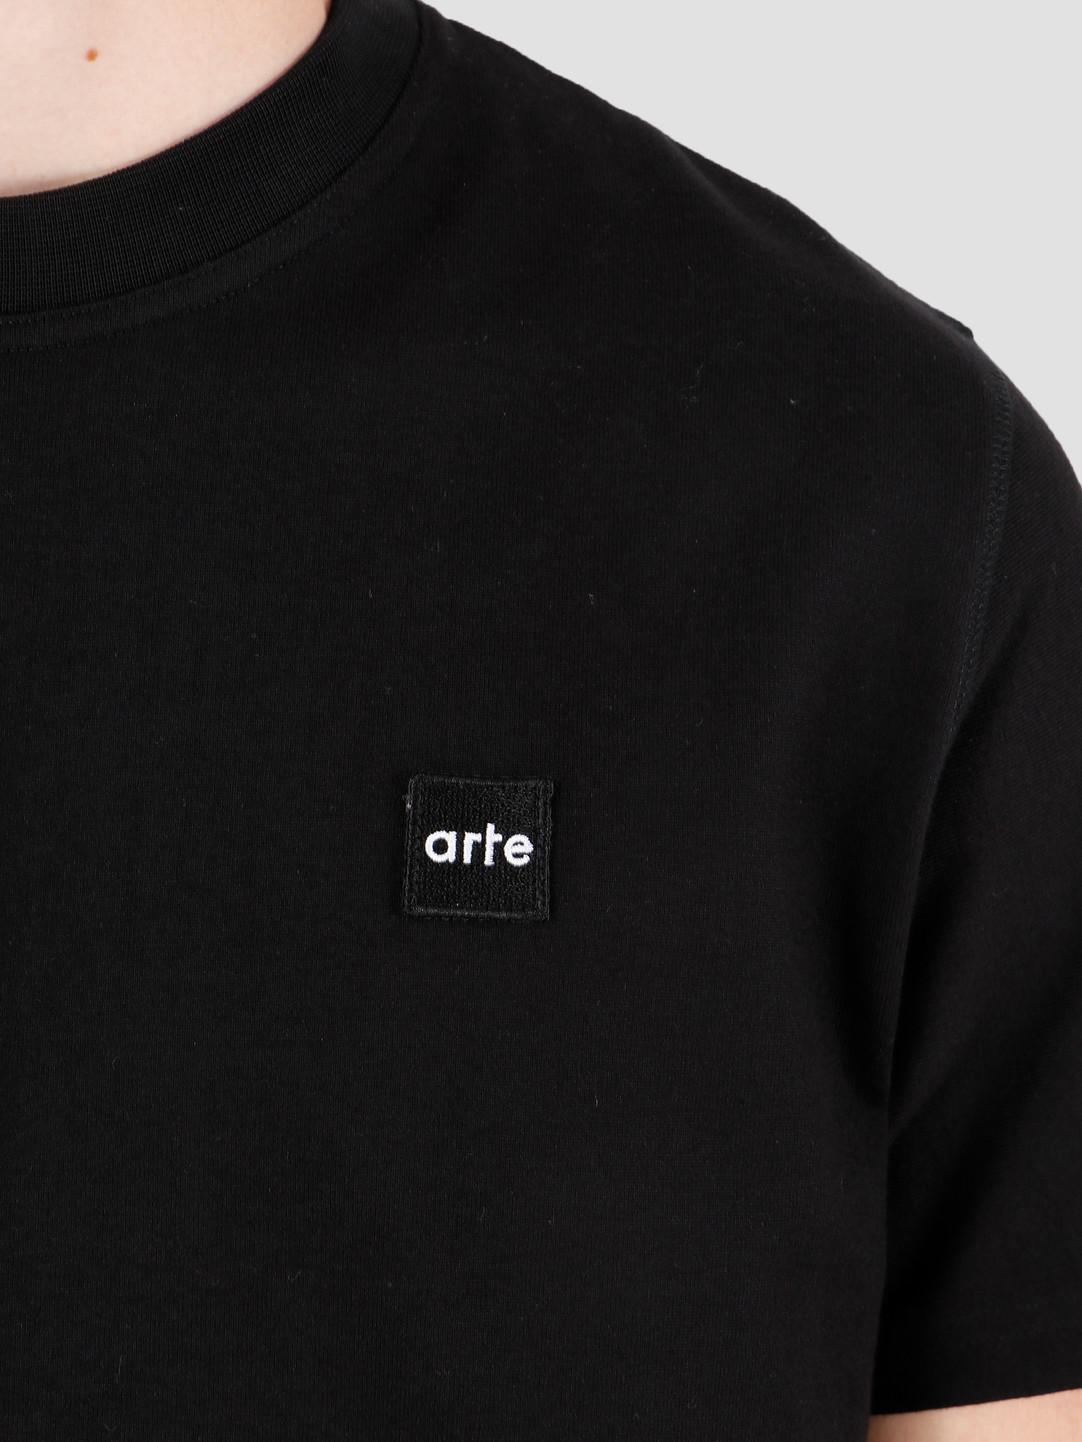 Arte Antwerp Arte Antwerp Tyler Patch T-Shirt Black AW19-073